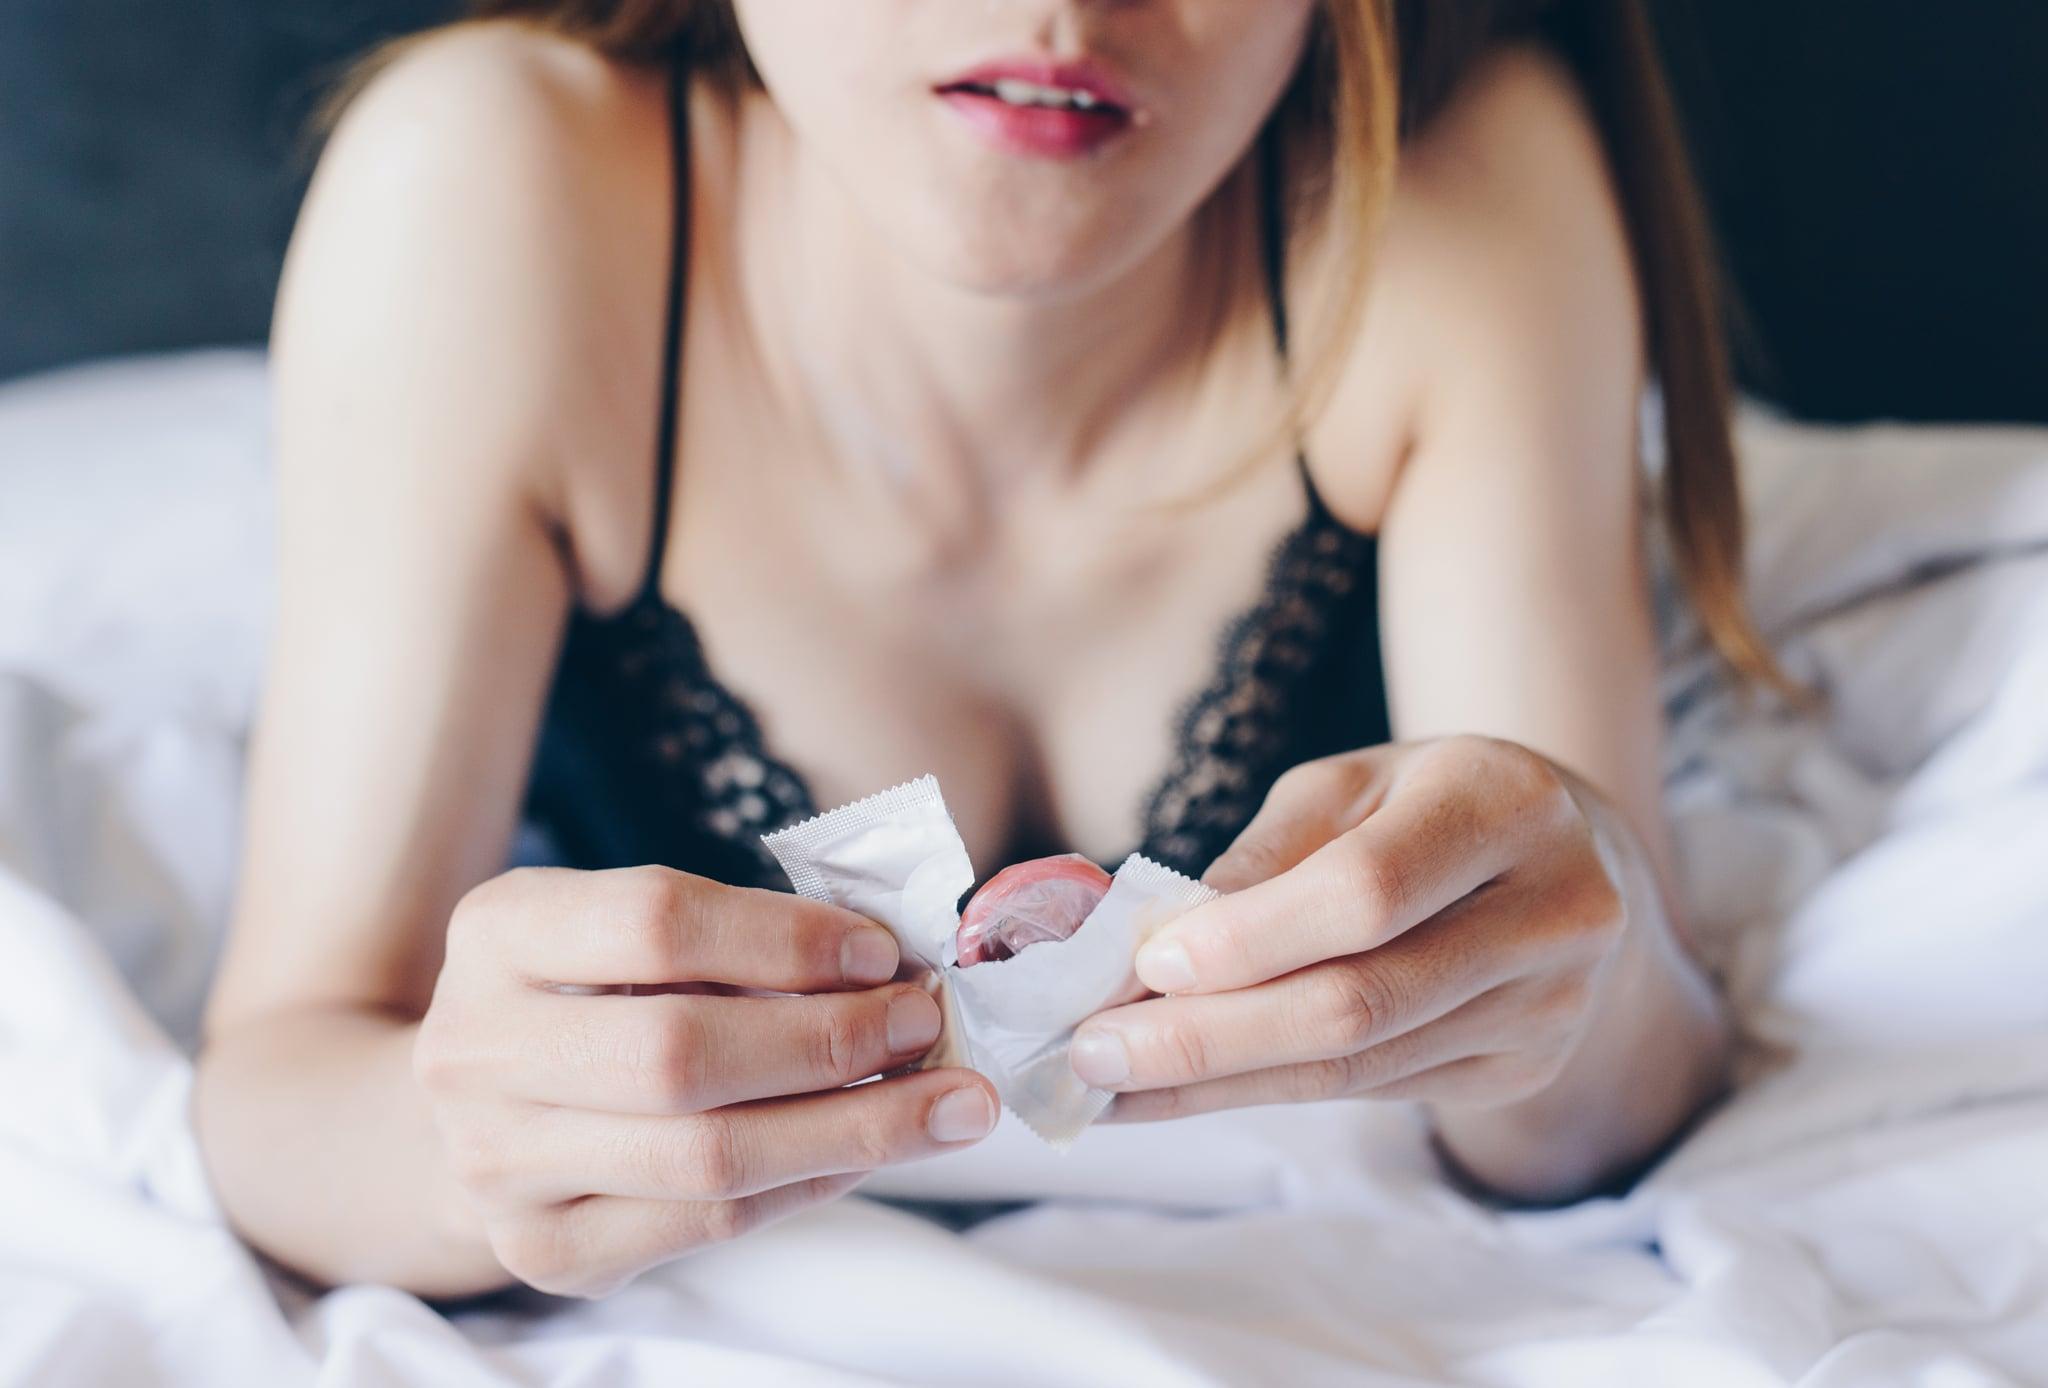 Safe sex and Prevent Pregnancy concept.